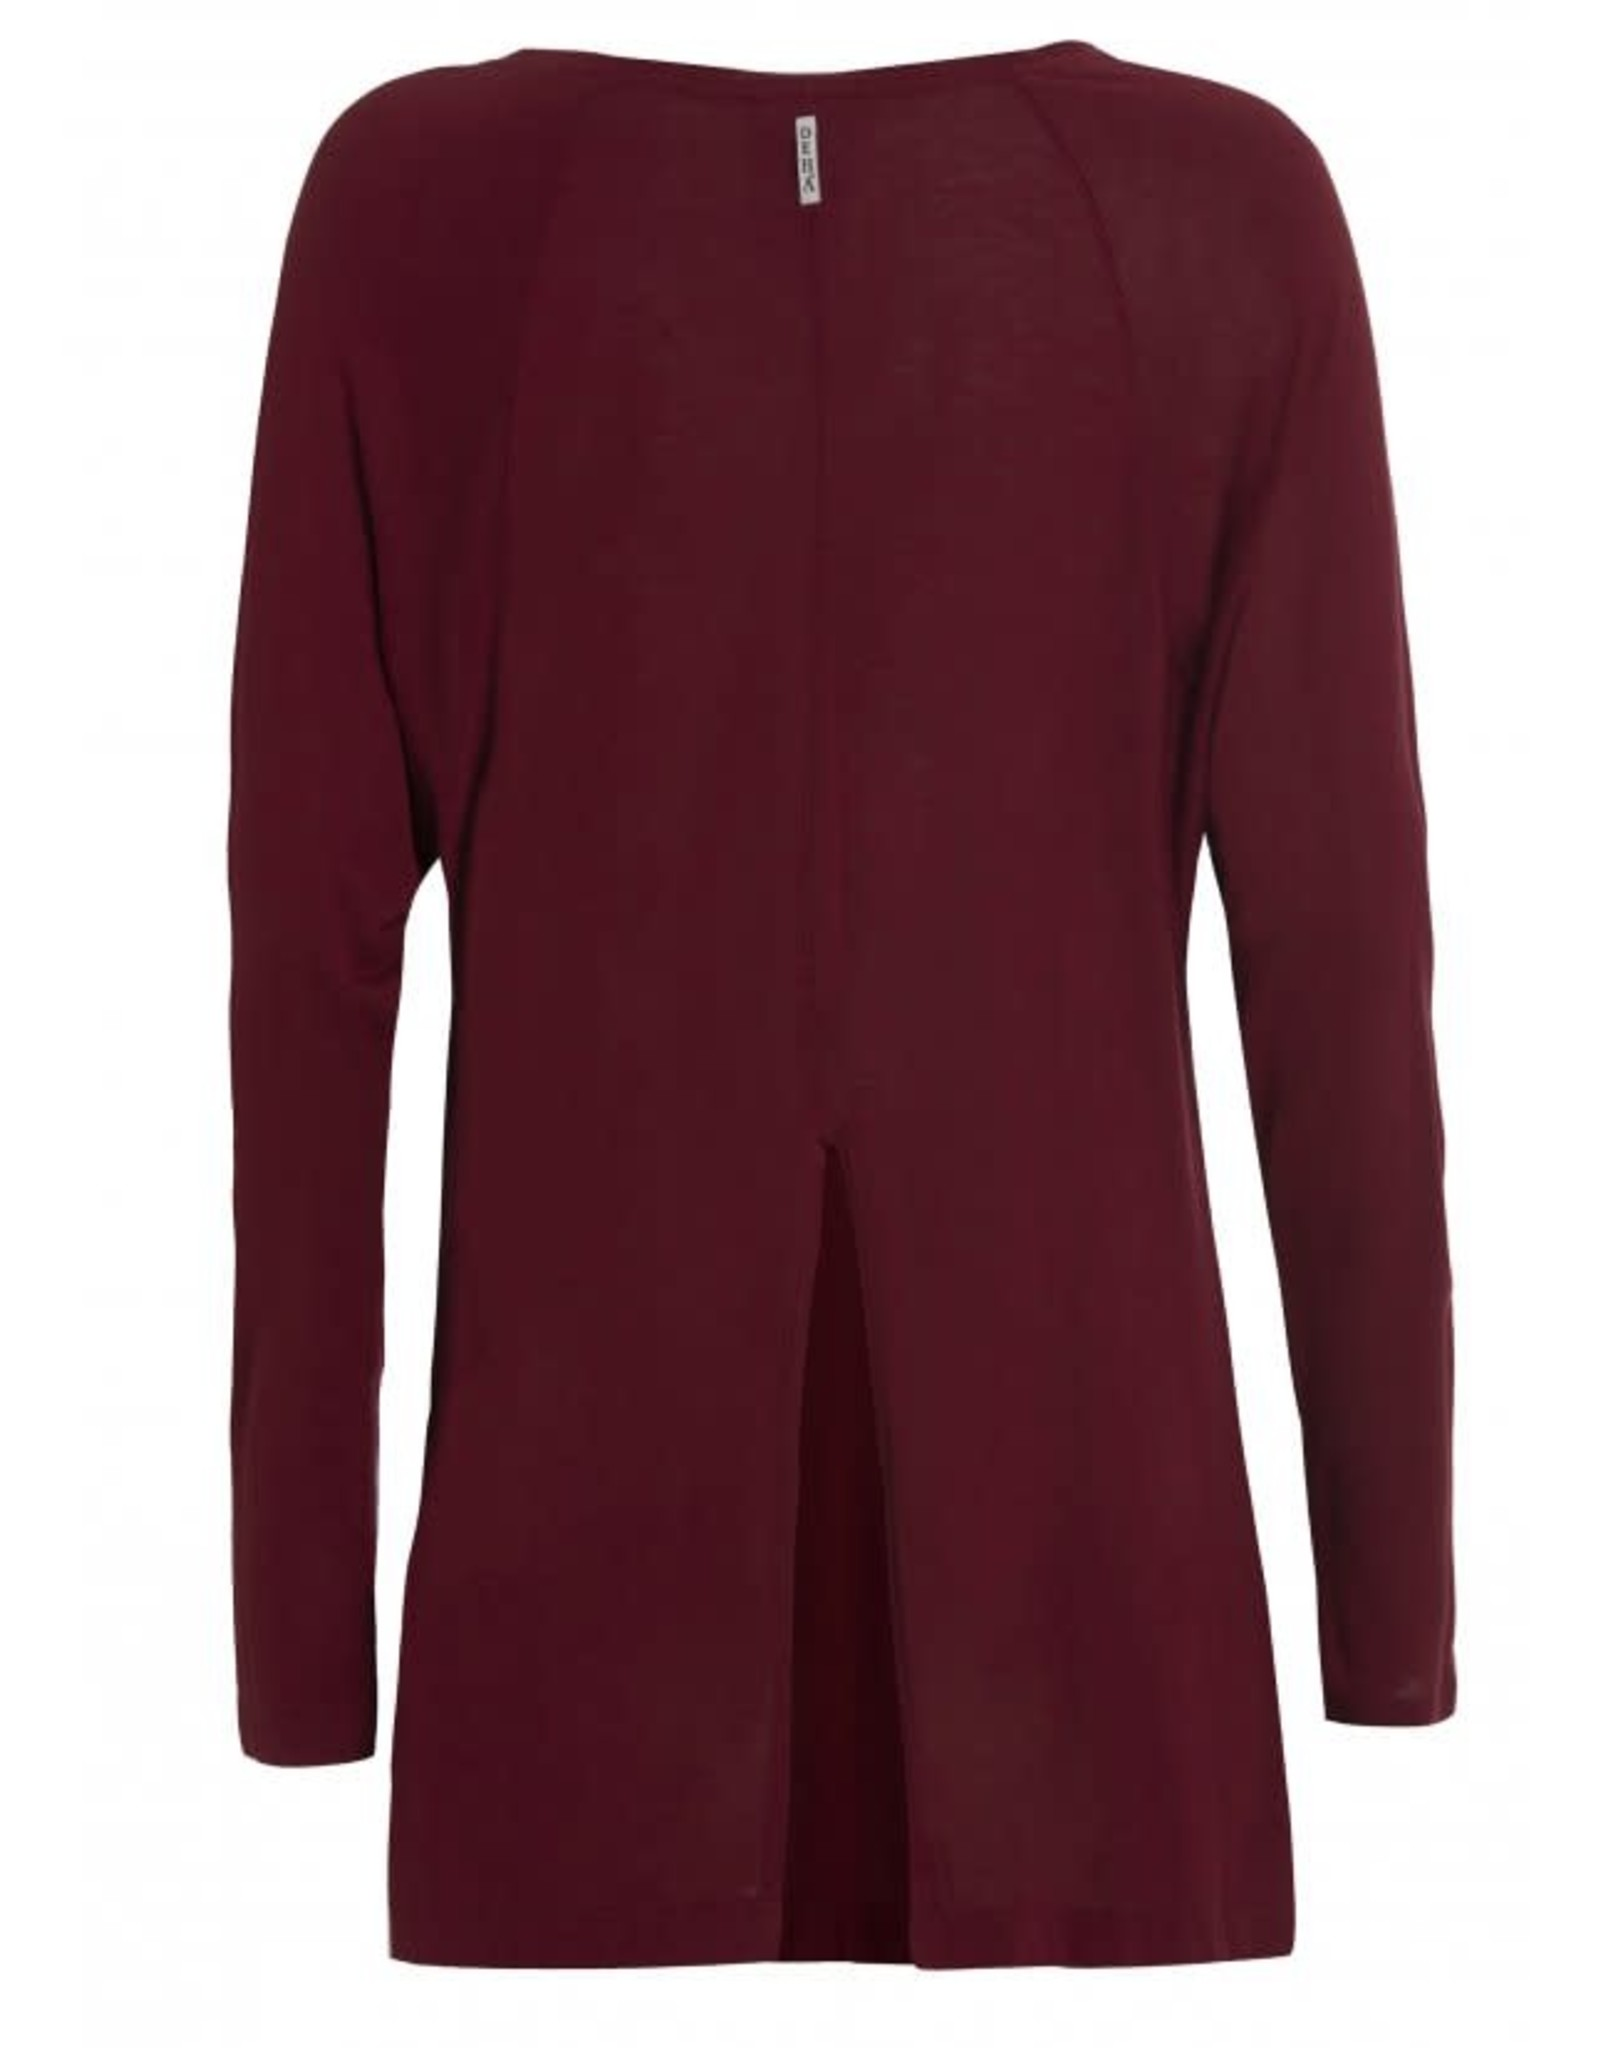 Deha B34530 Long sleeves T-shirt